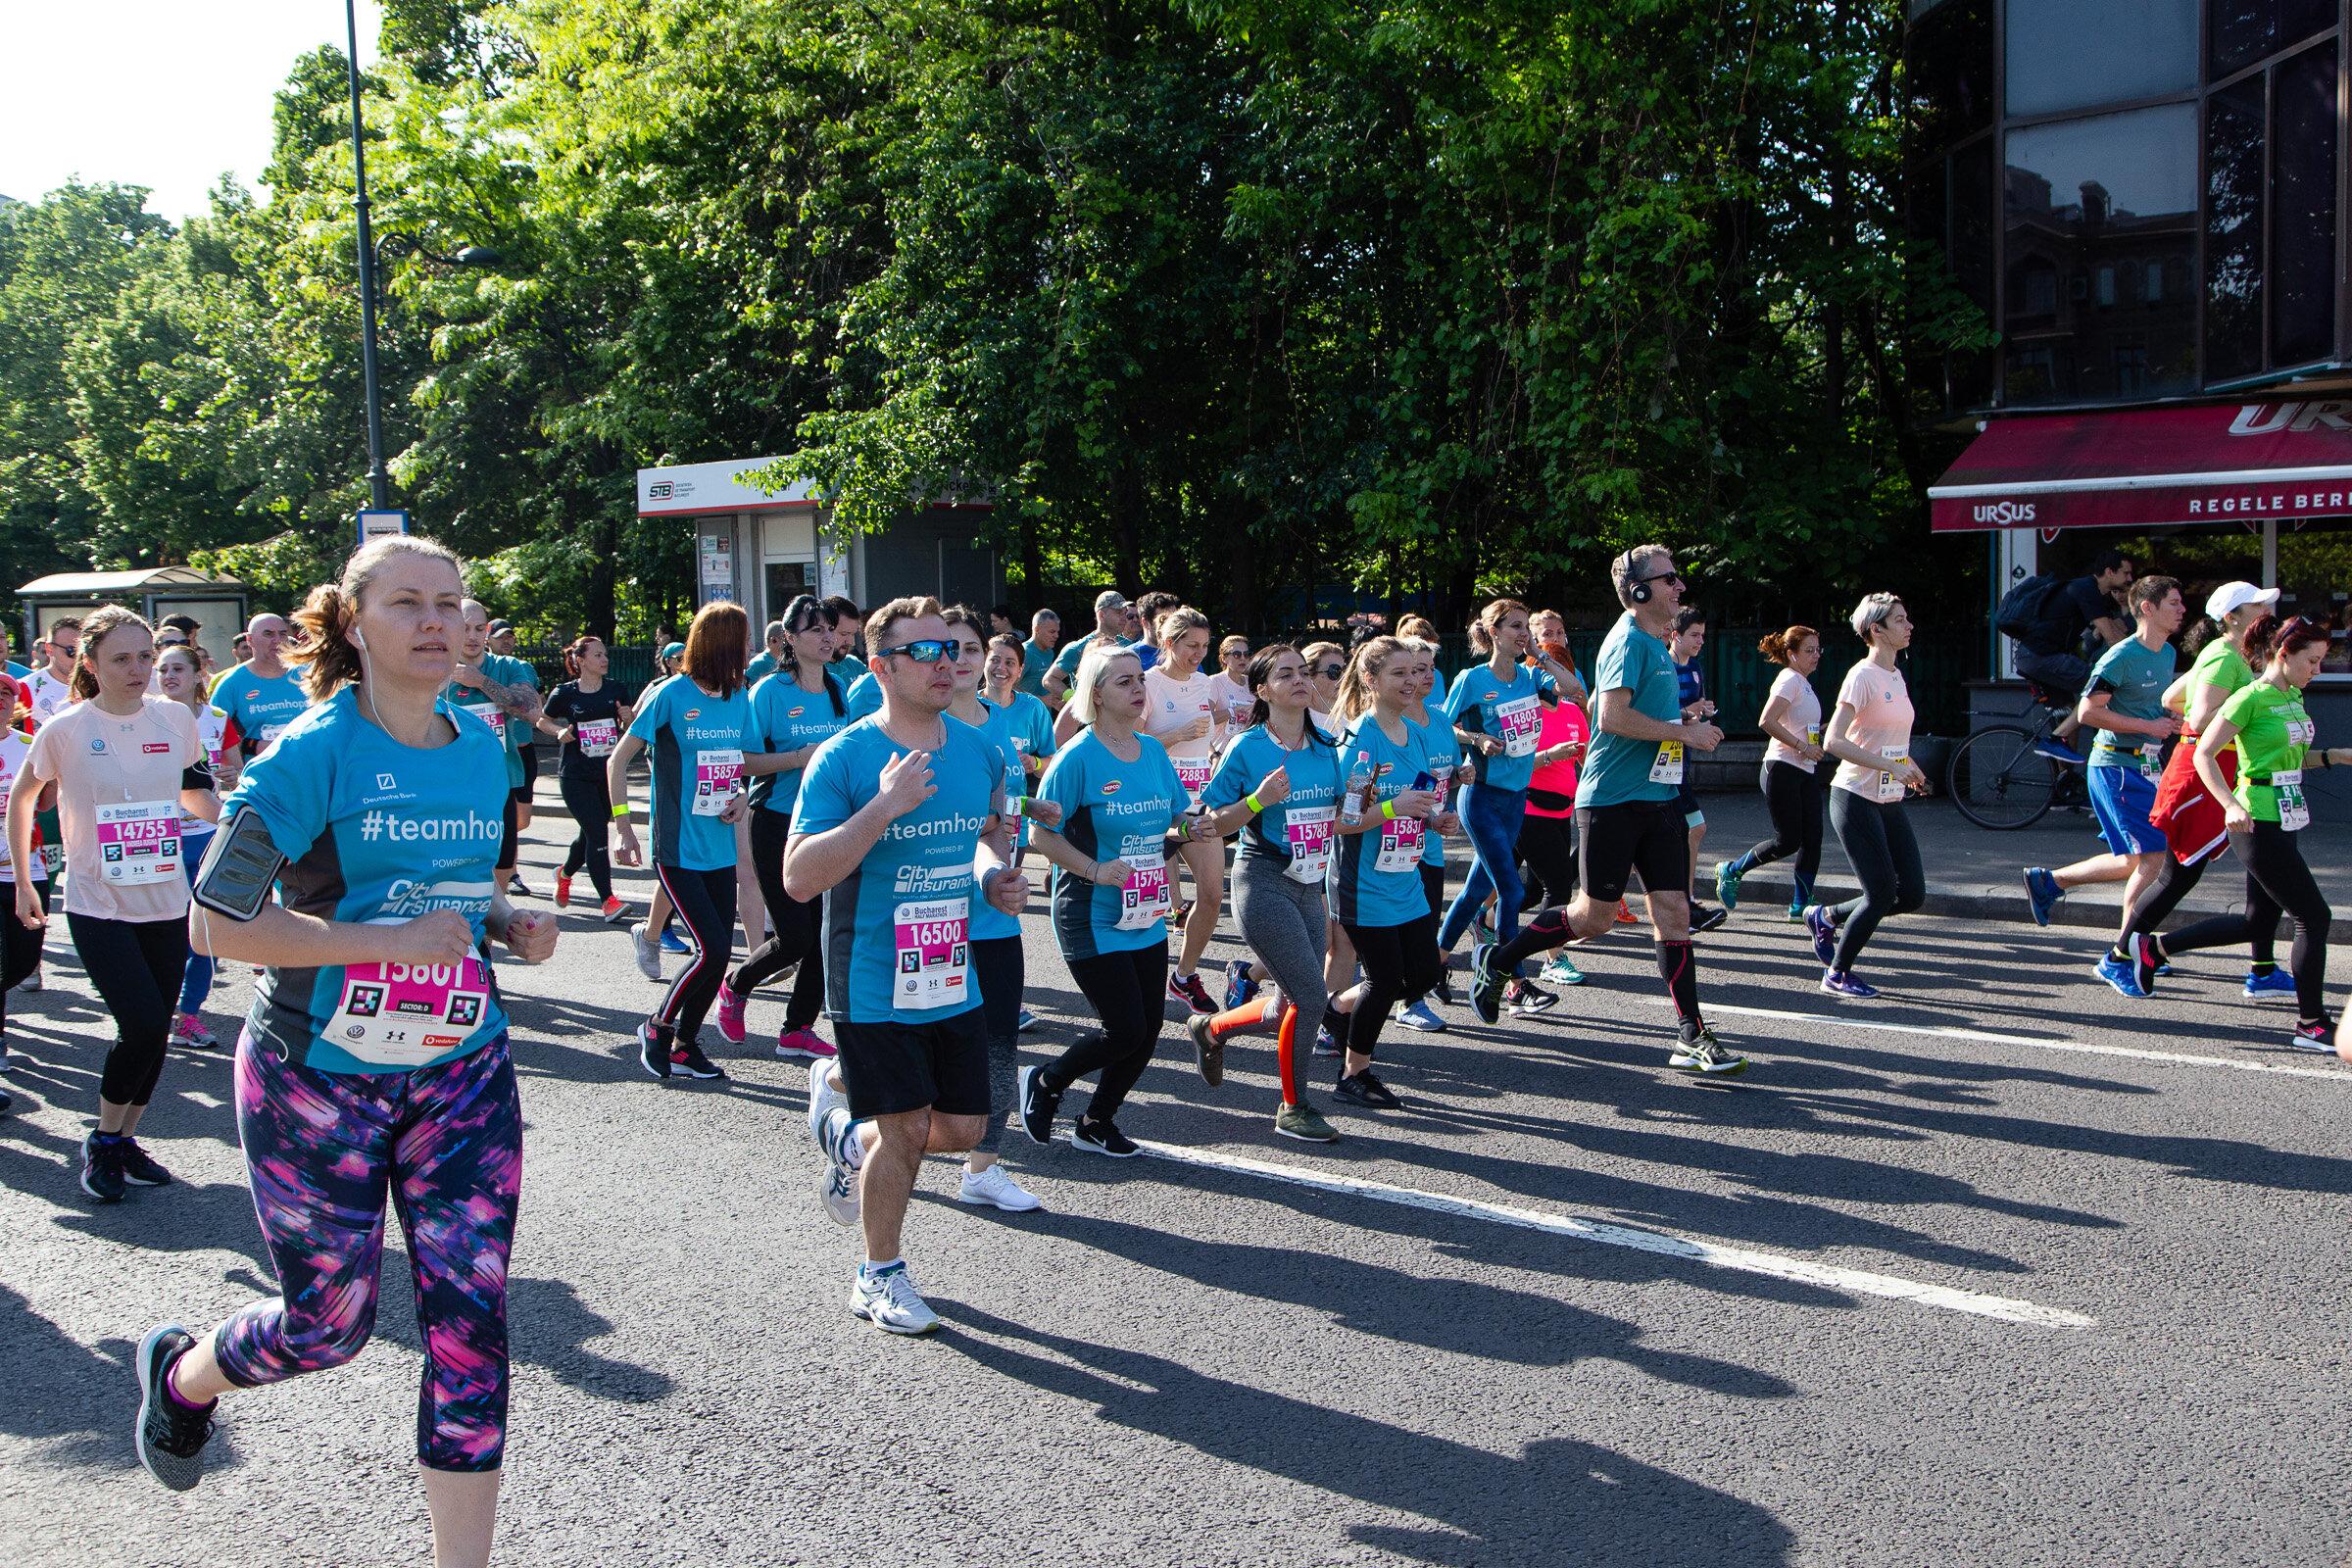 Alergatori Team Hope_Semimaratonul Bucuresti_06_Foto MIhnea Ciulei.jpg